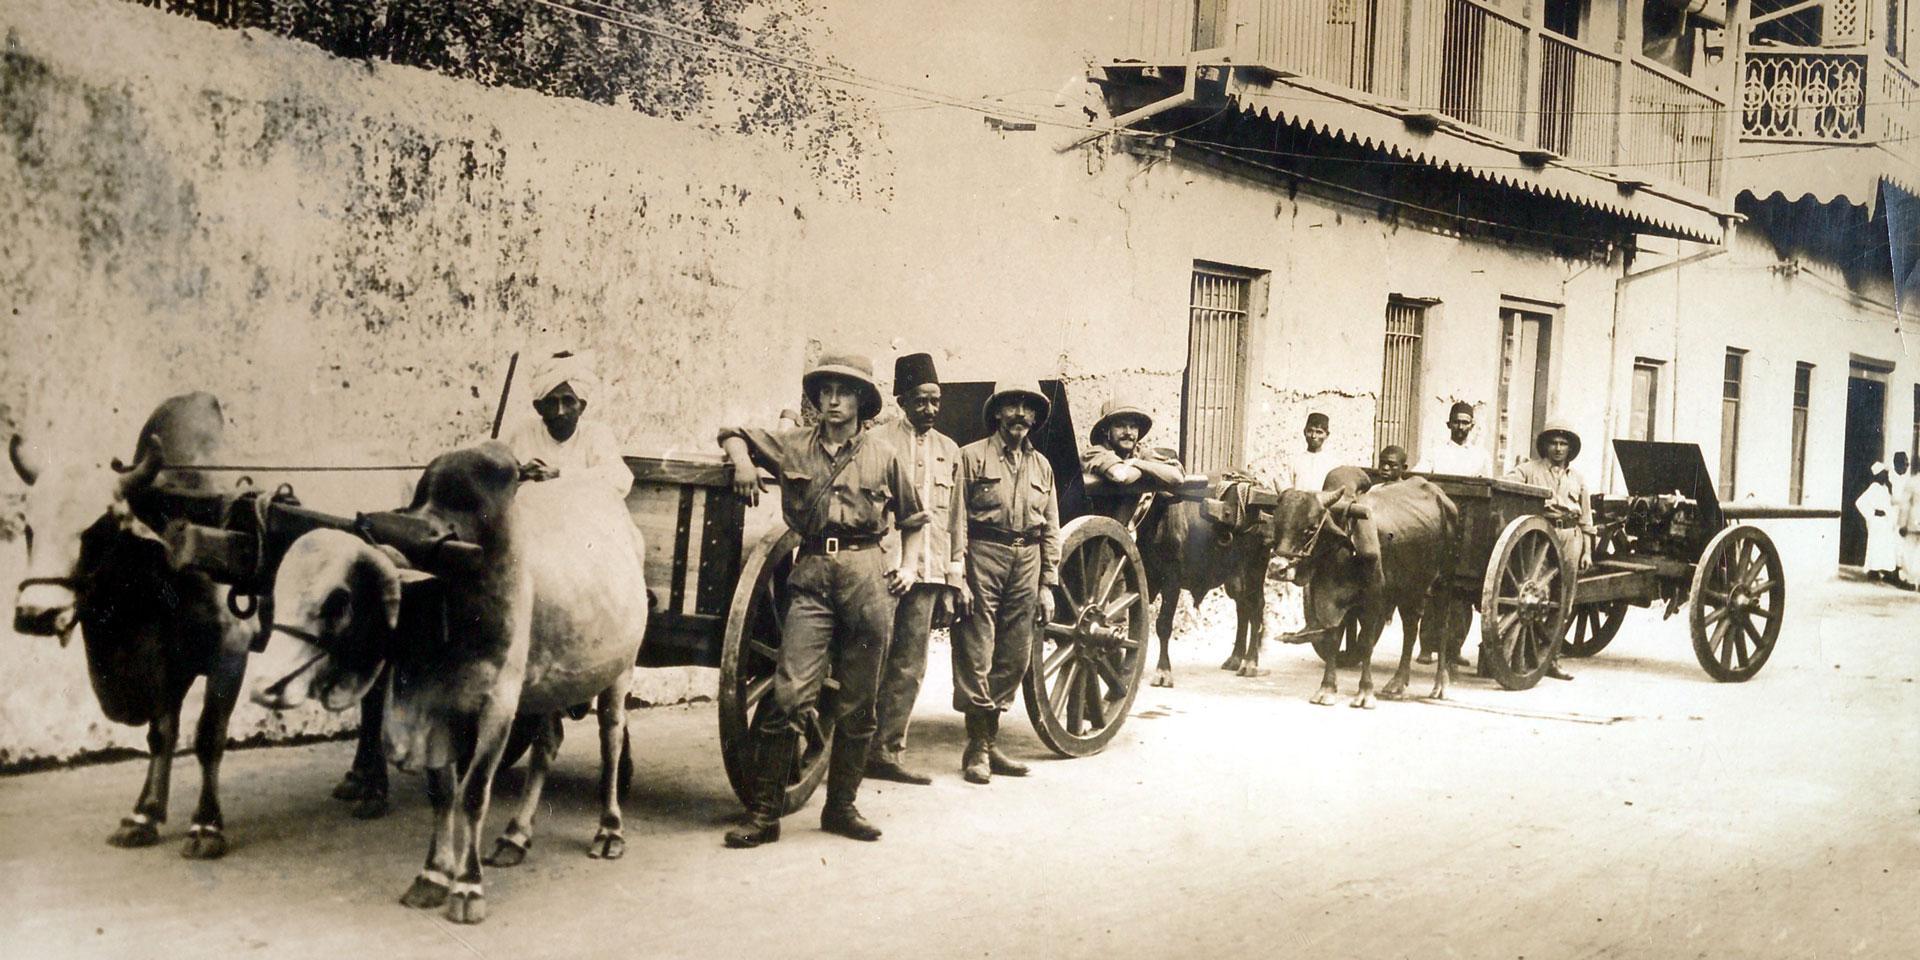 Oxen pulling British guns, 1914